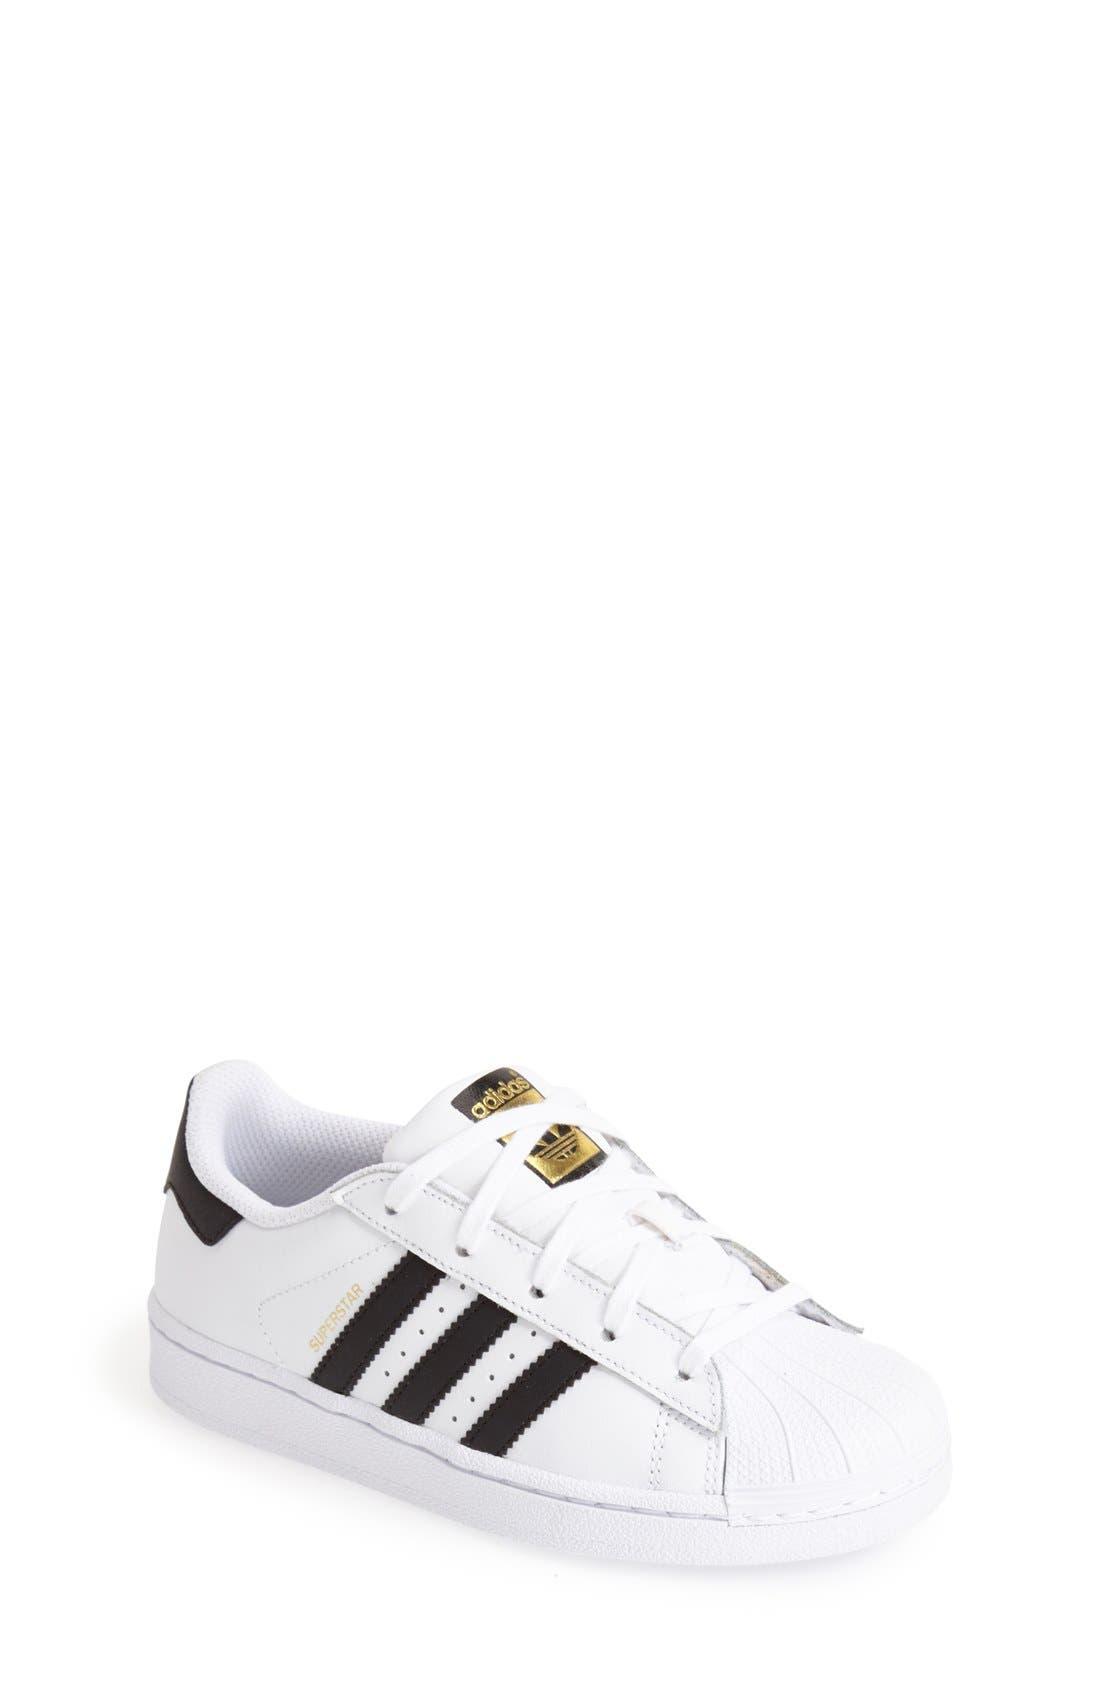 adidas \u0027Superstar C\u0027 Sneaker (Toddler \u0026 Little Kid). WHITE/ ...